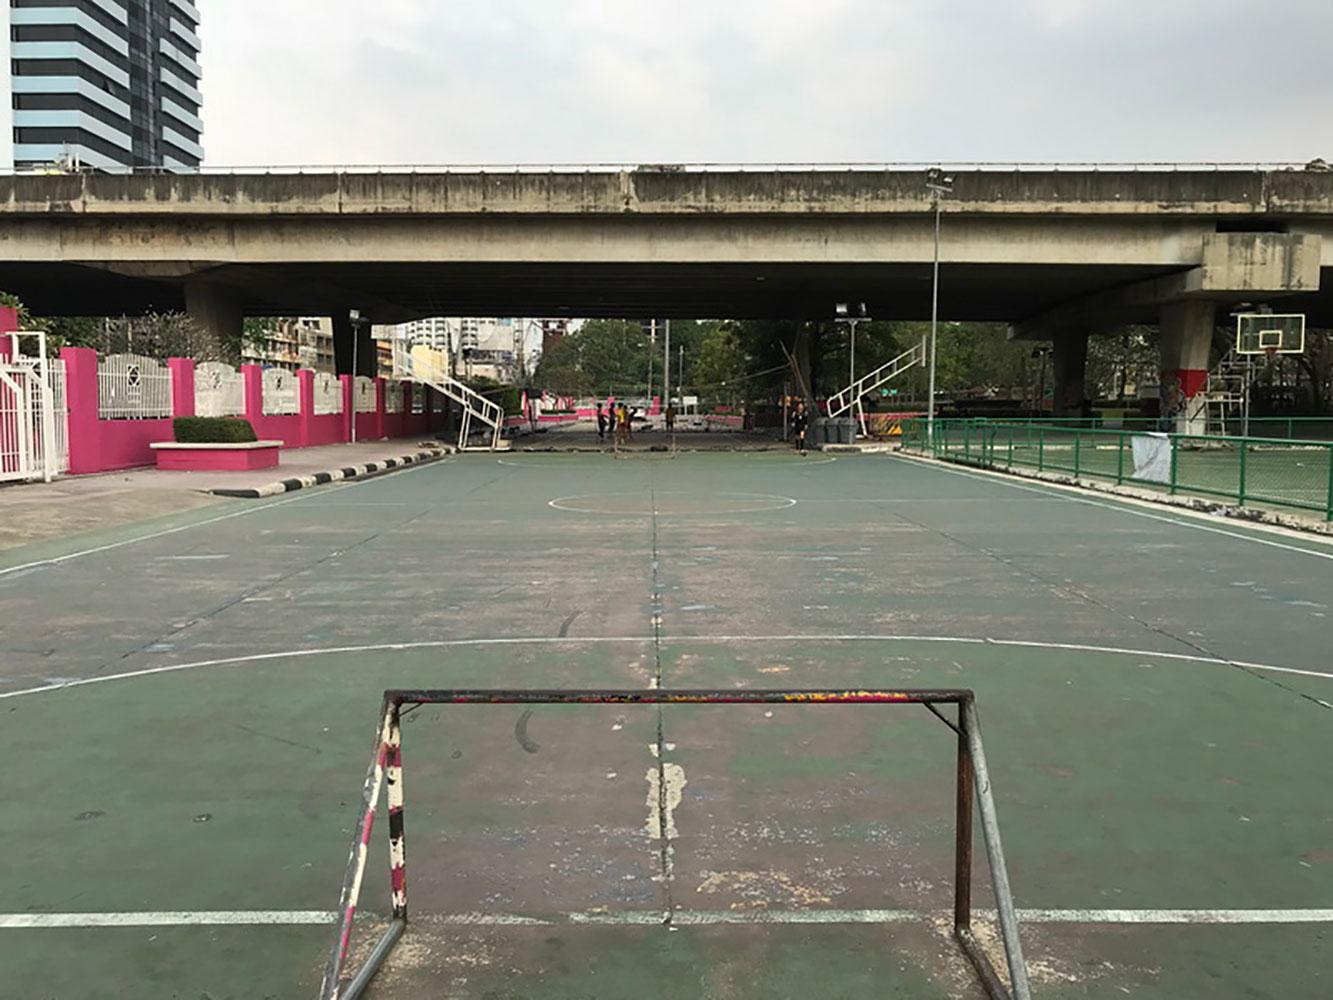 Urban soccer field in Bangkok Thailand